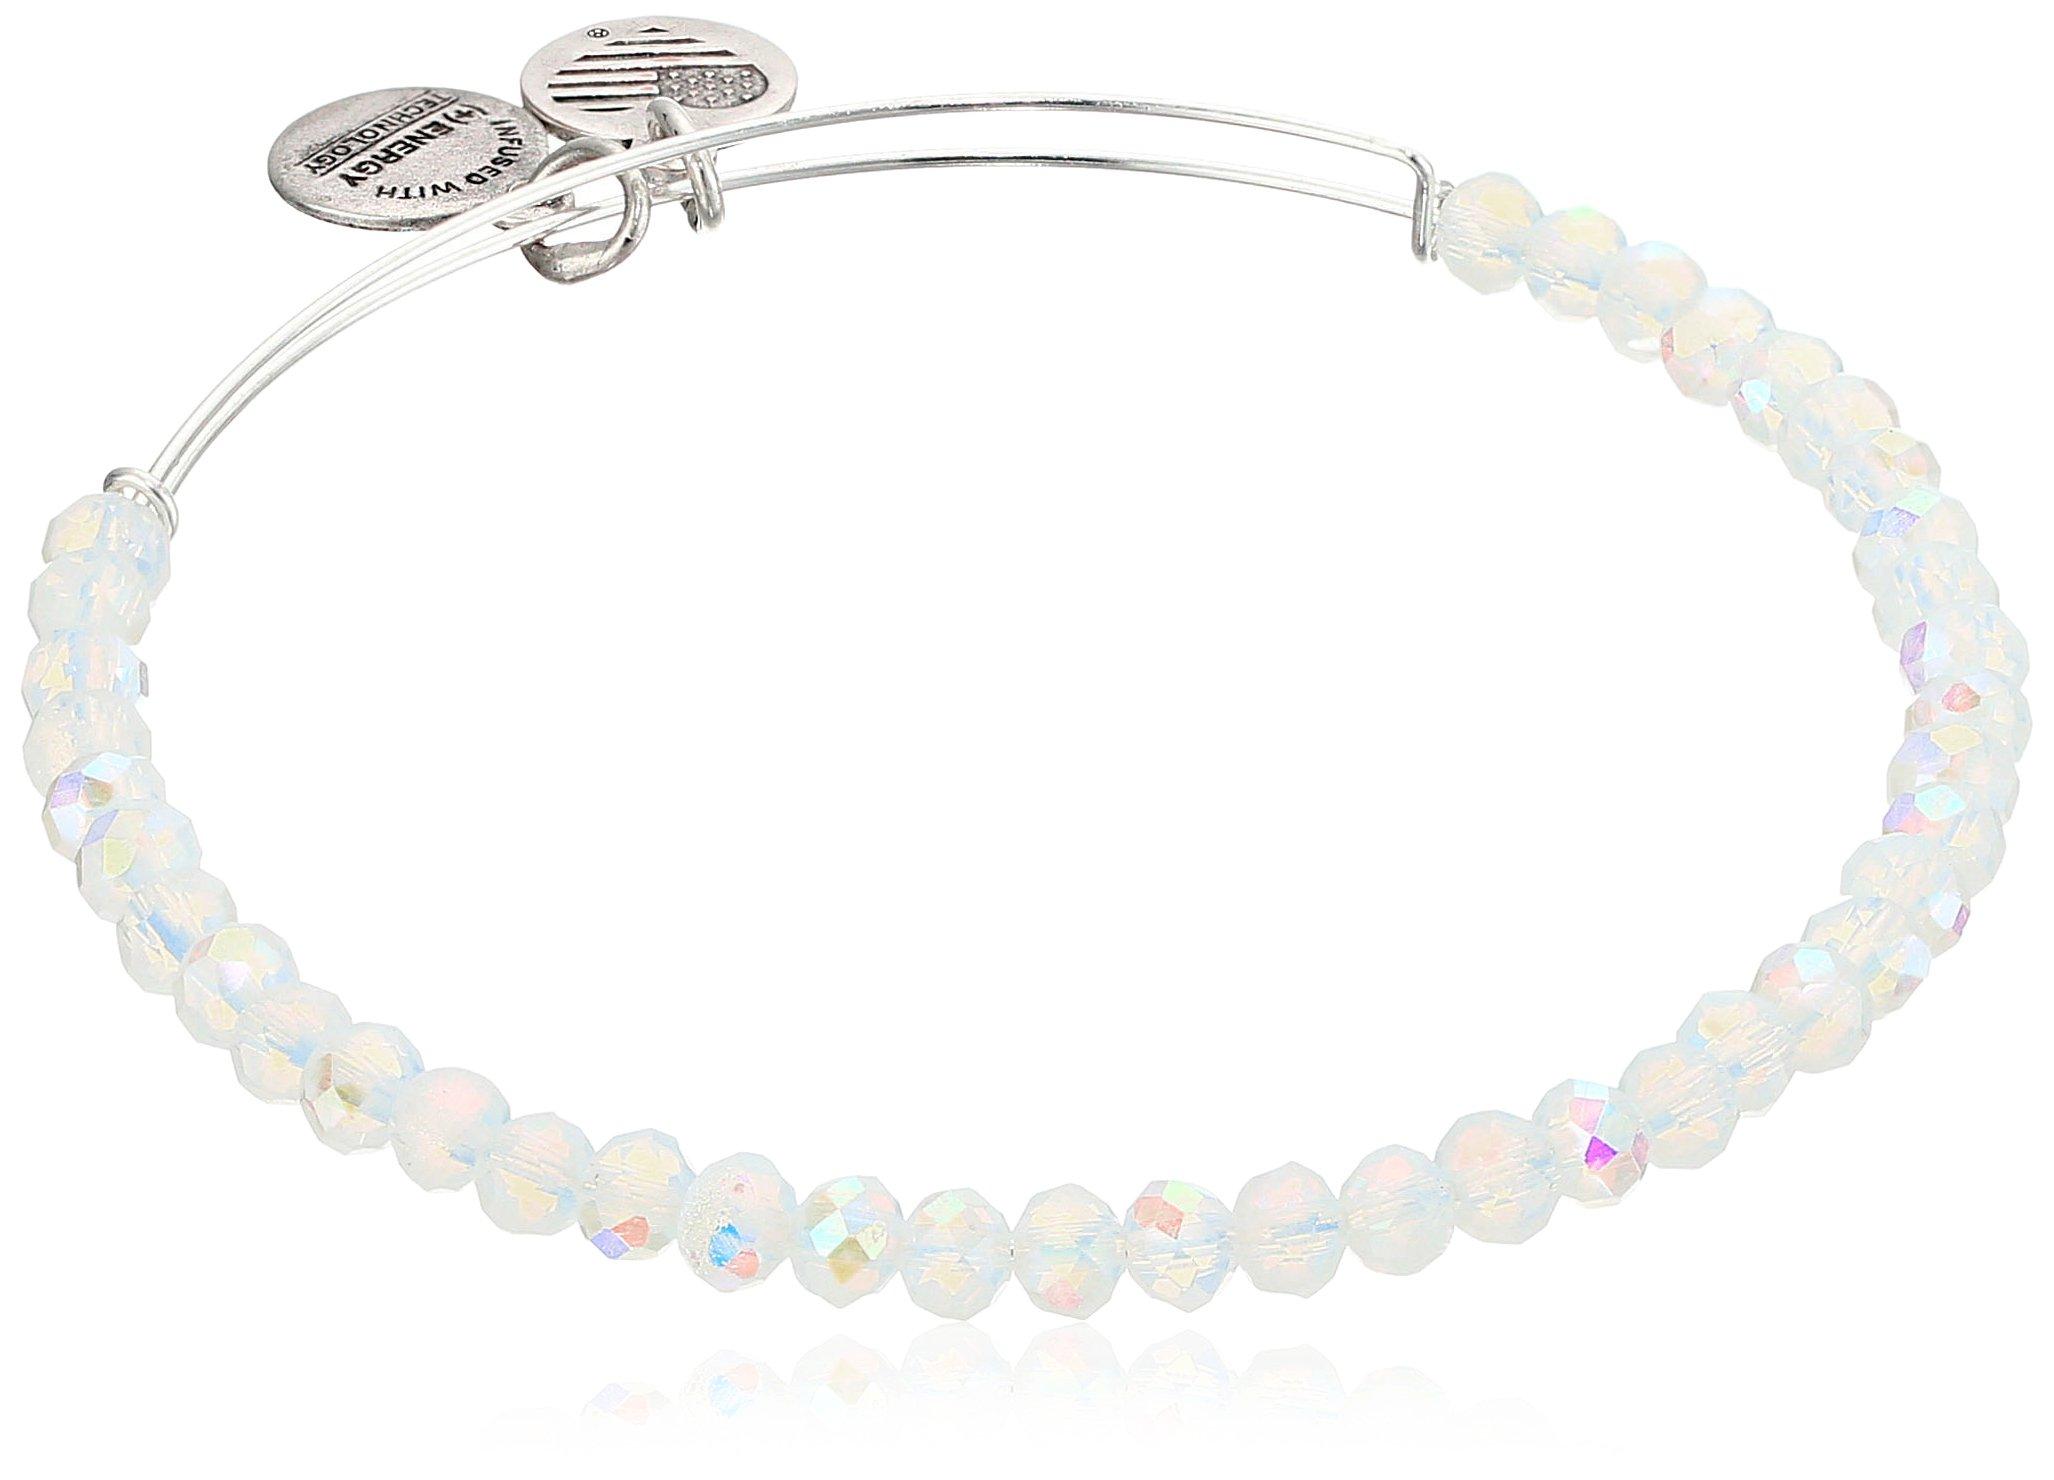 Alex and Ani Brilliance Bead Moonlight White/Shinny Silver Bracelet